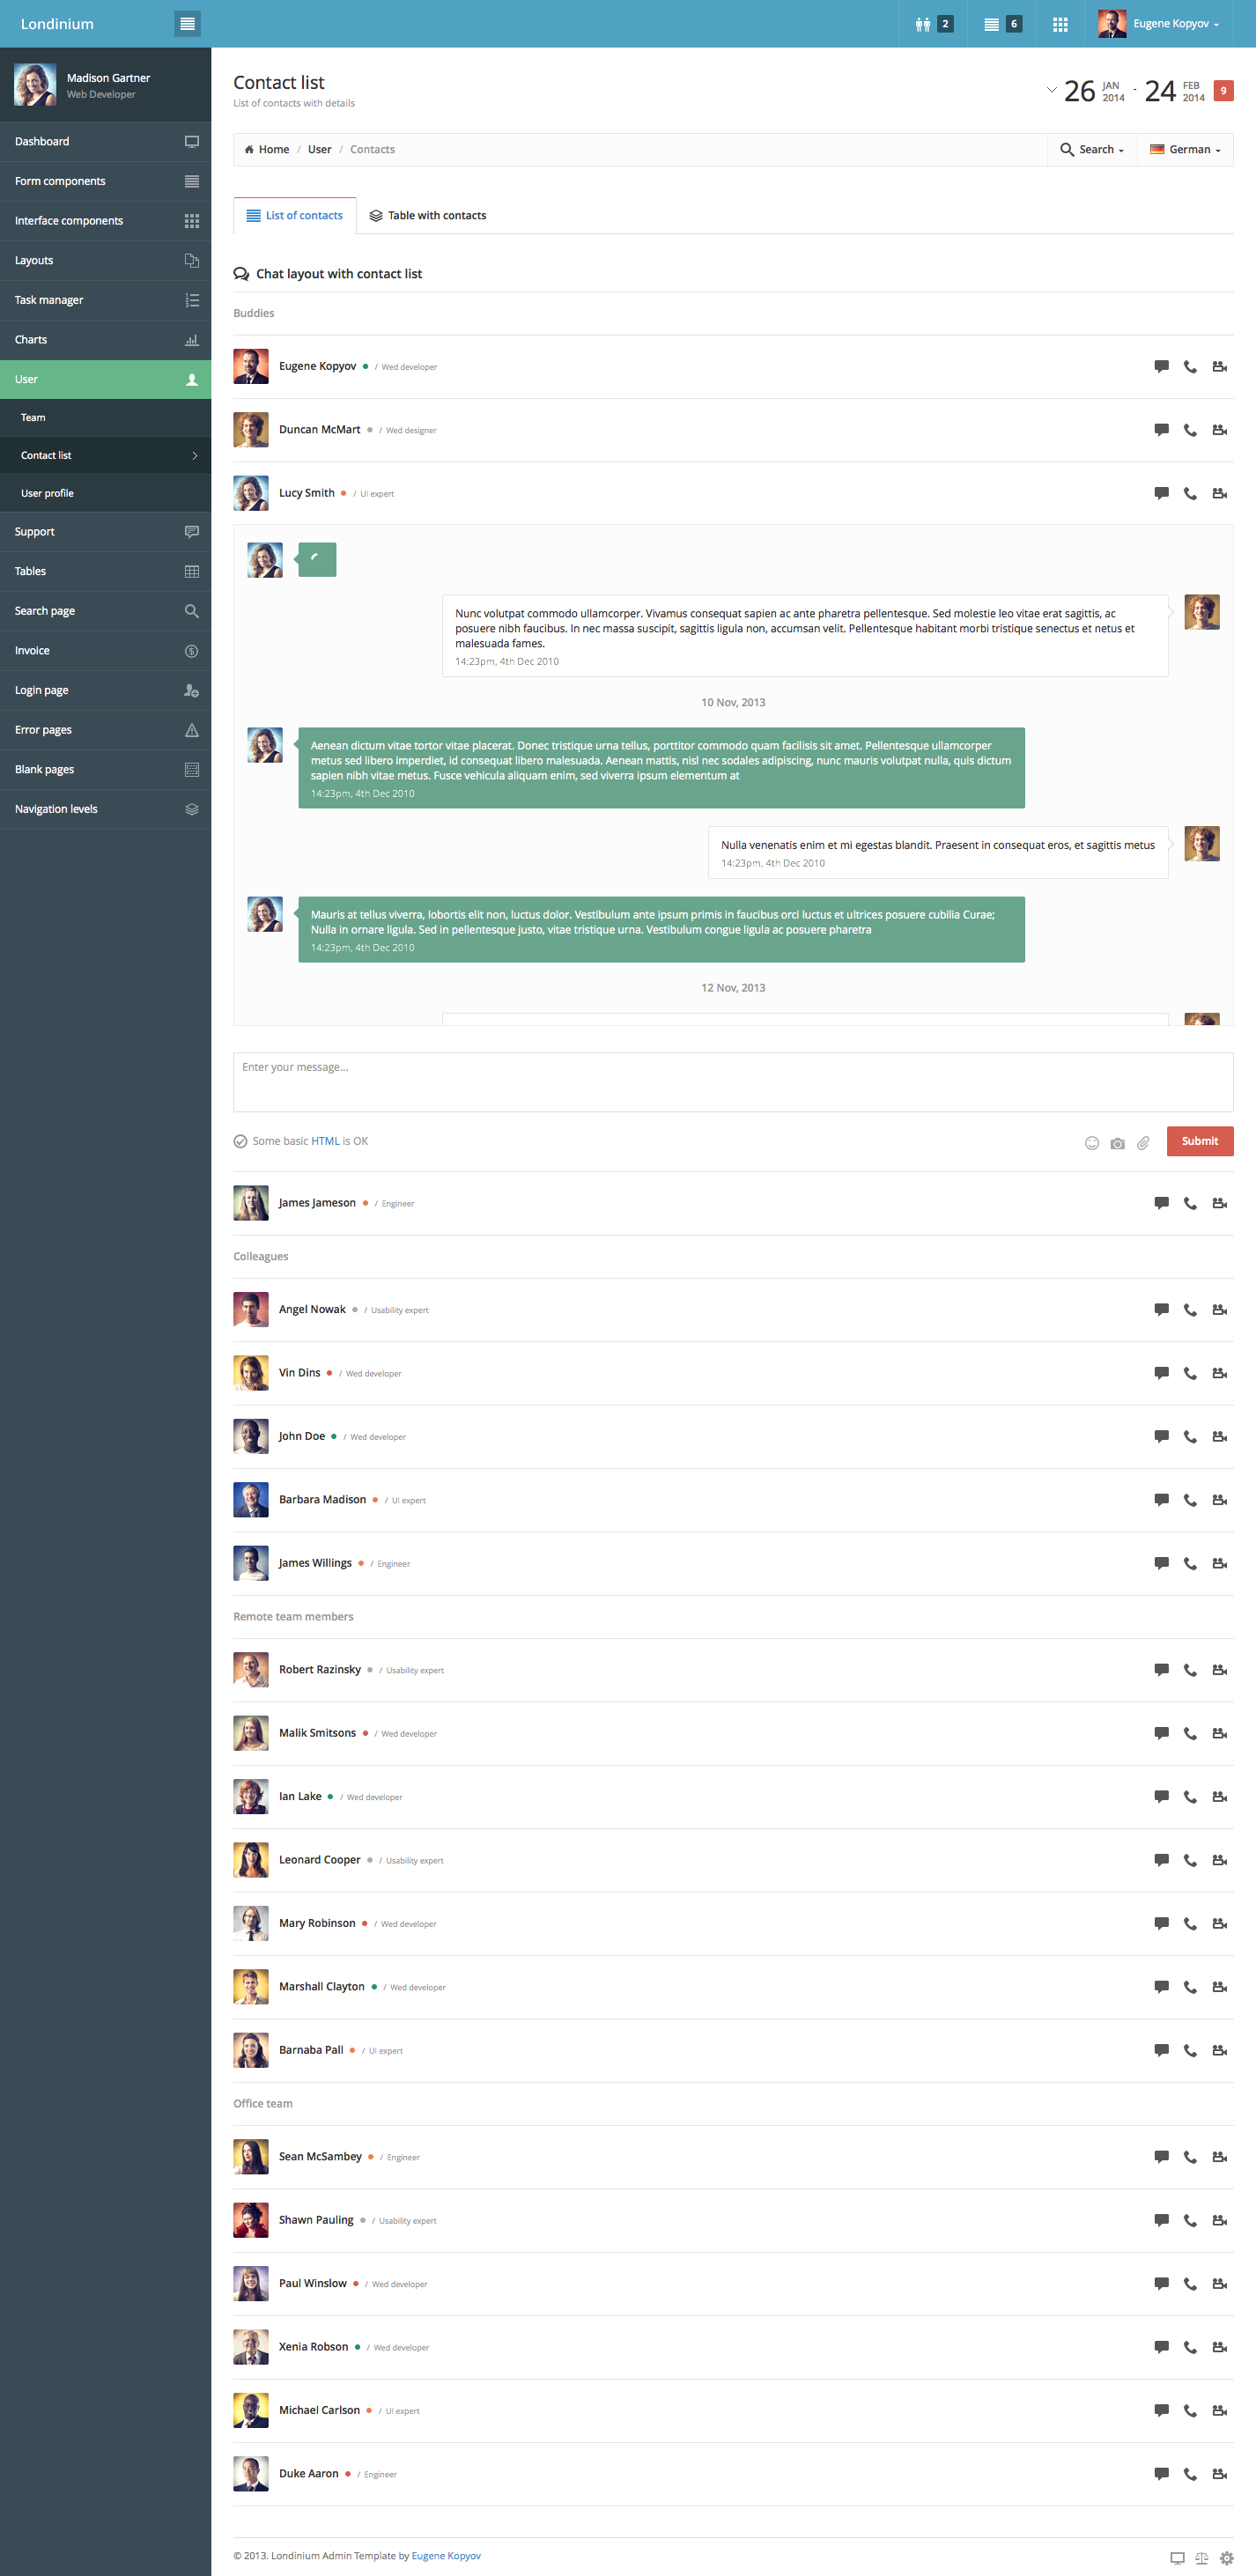 Londinium - responsive bootstrap 3 admin template by Kopyov ...